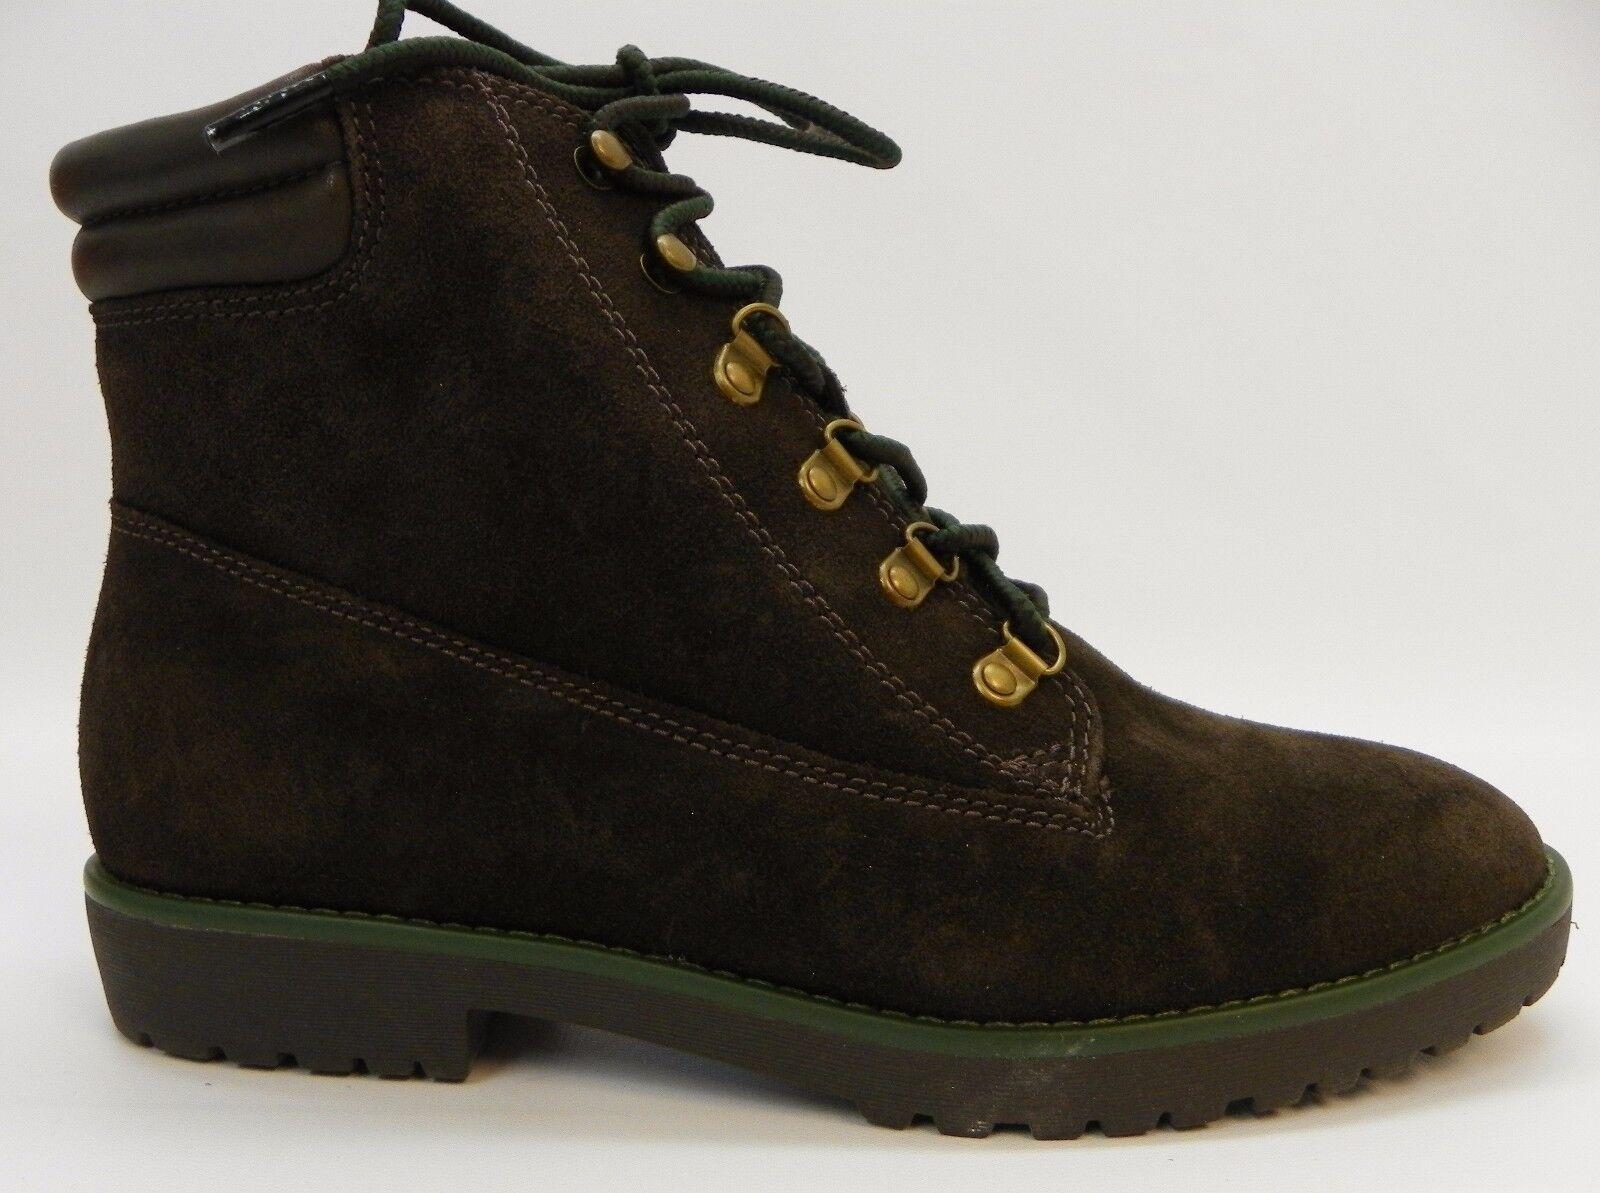 Lauren Ralph Lauren Zapatos para mujer botas con Cordones Gamuza Gamuza Gamuza miklelle Chocolate Oscuro 9  nuevo listado